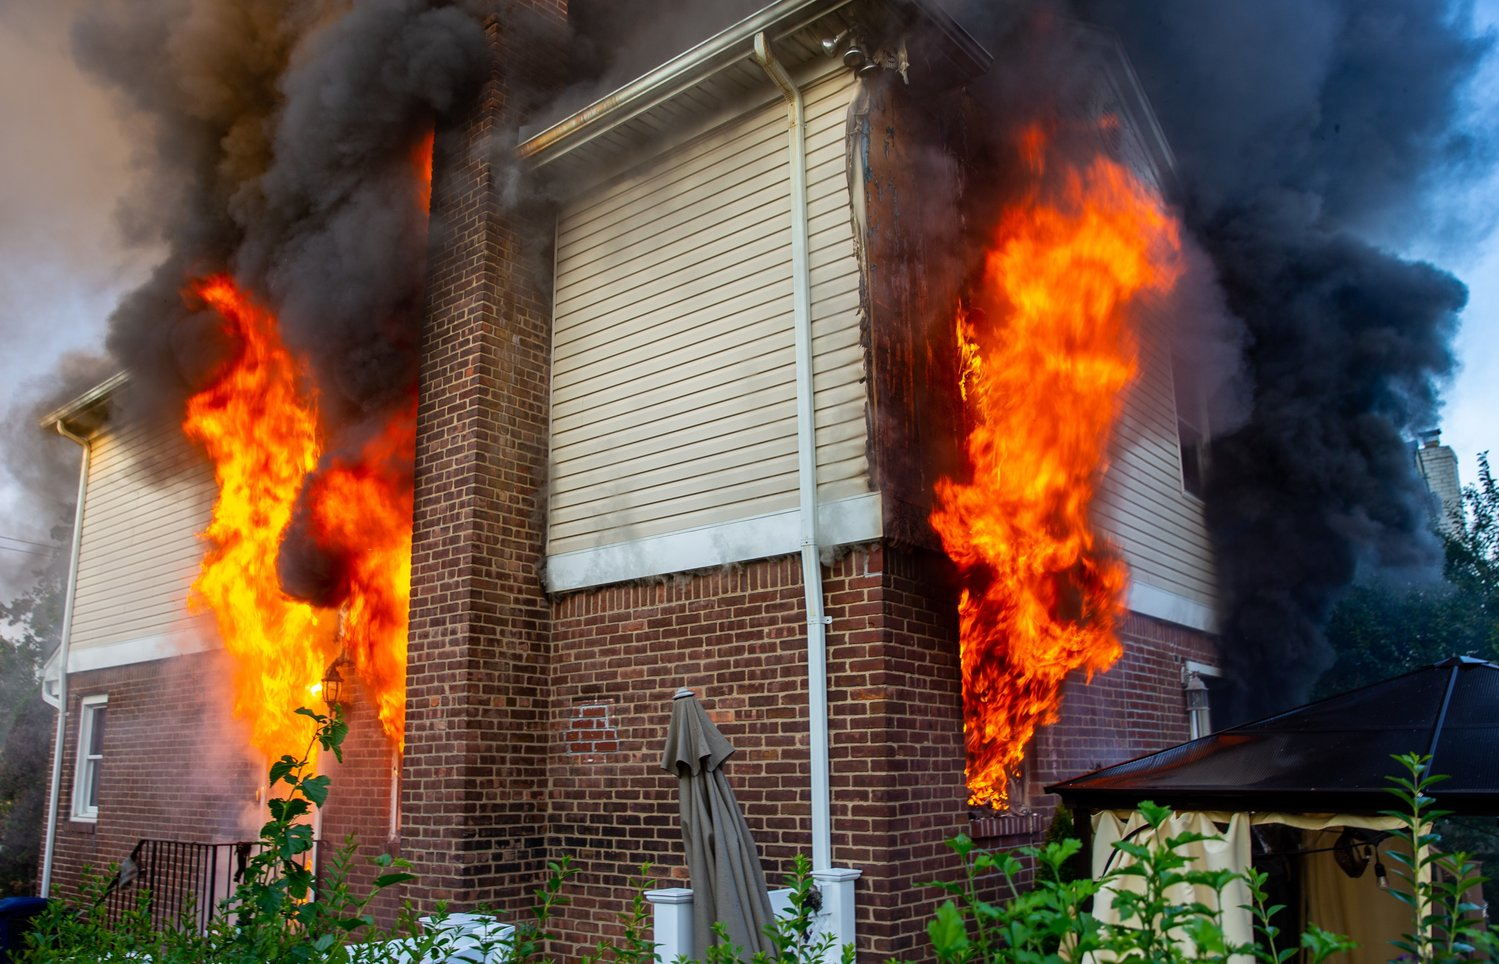 20200903 113300 92275 MW A Malverne house fire 9 3.